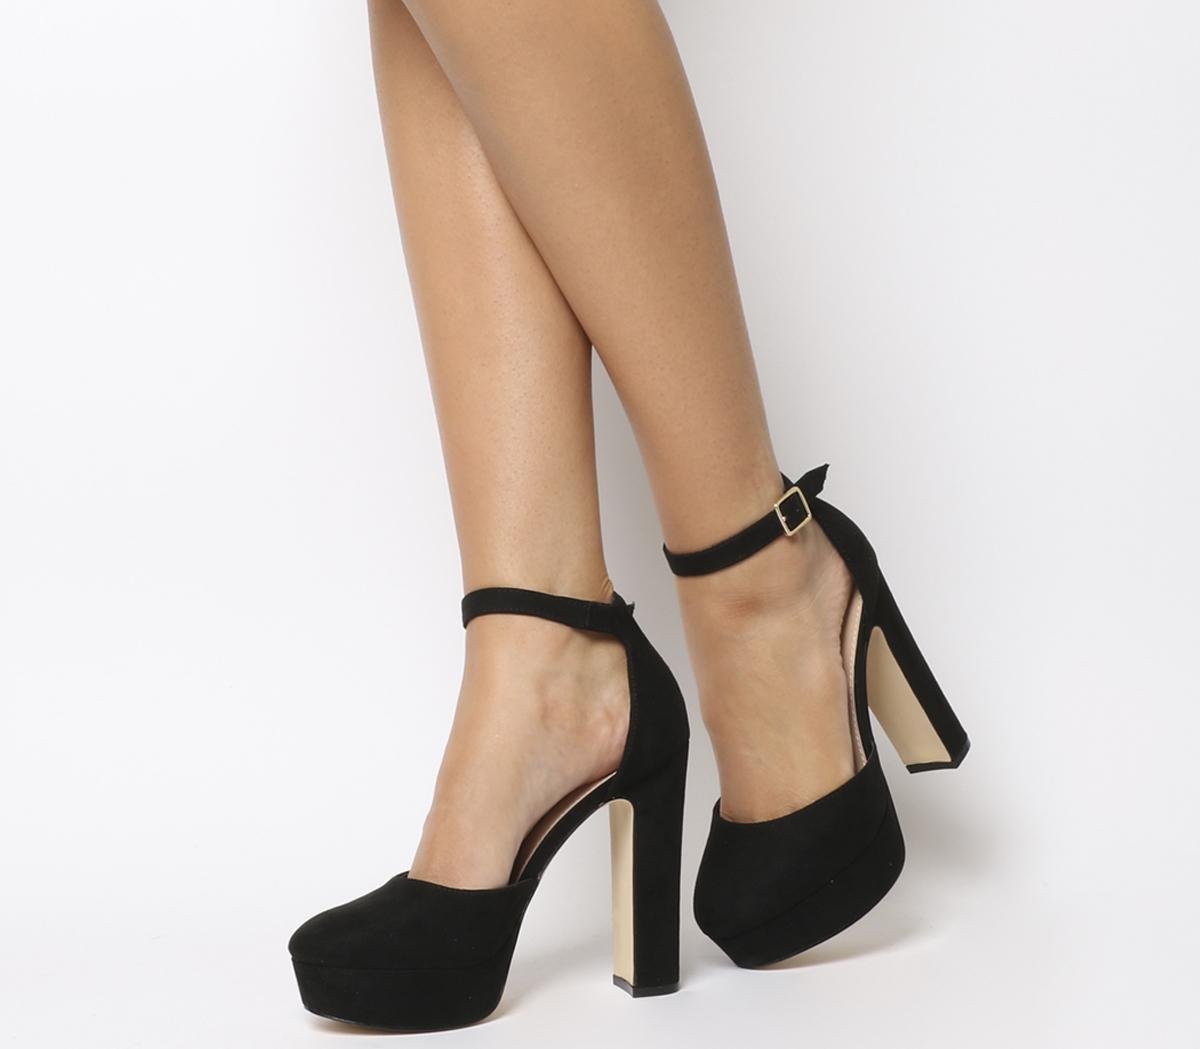 Jillian Black Cut Out Peep Toe Heels - $72 | Tobi US